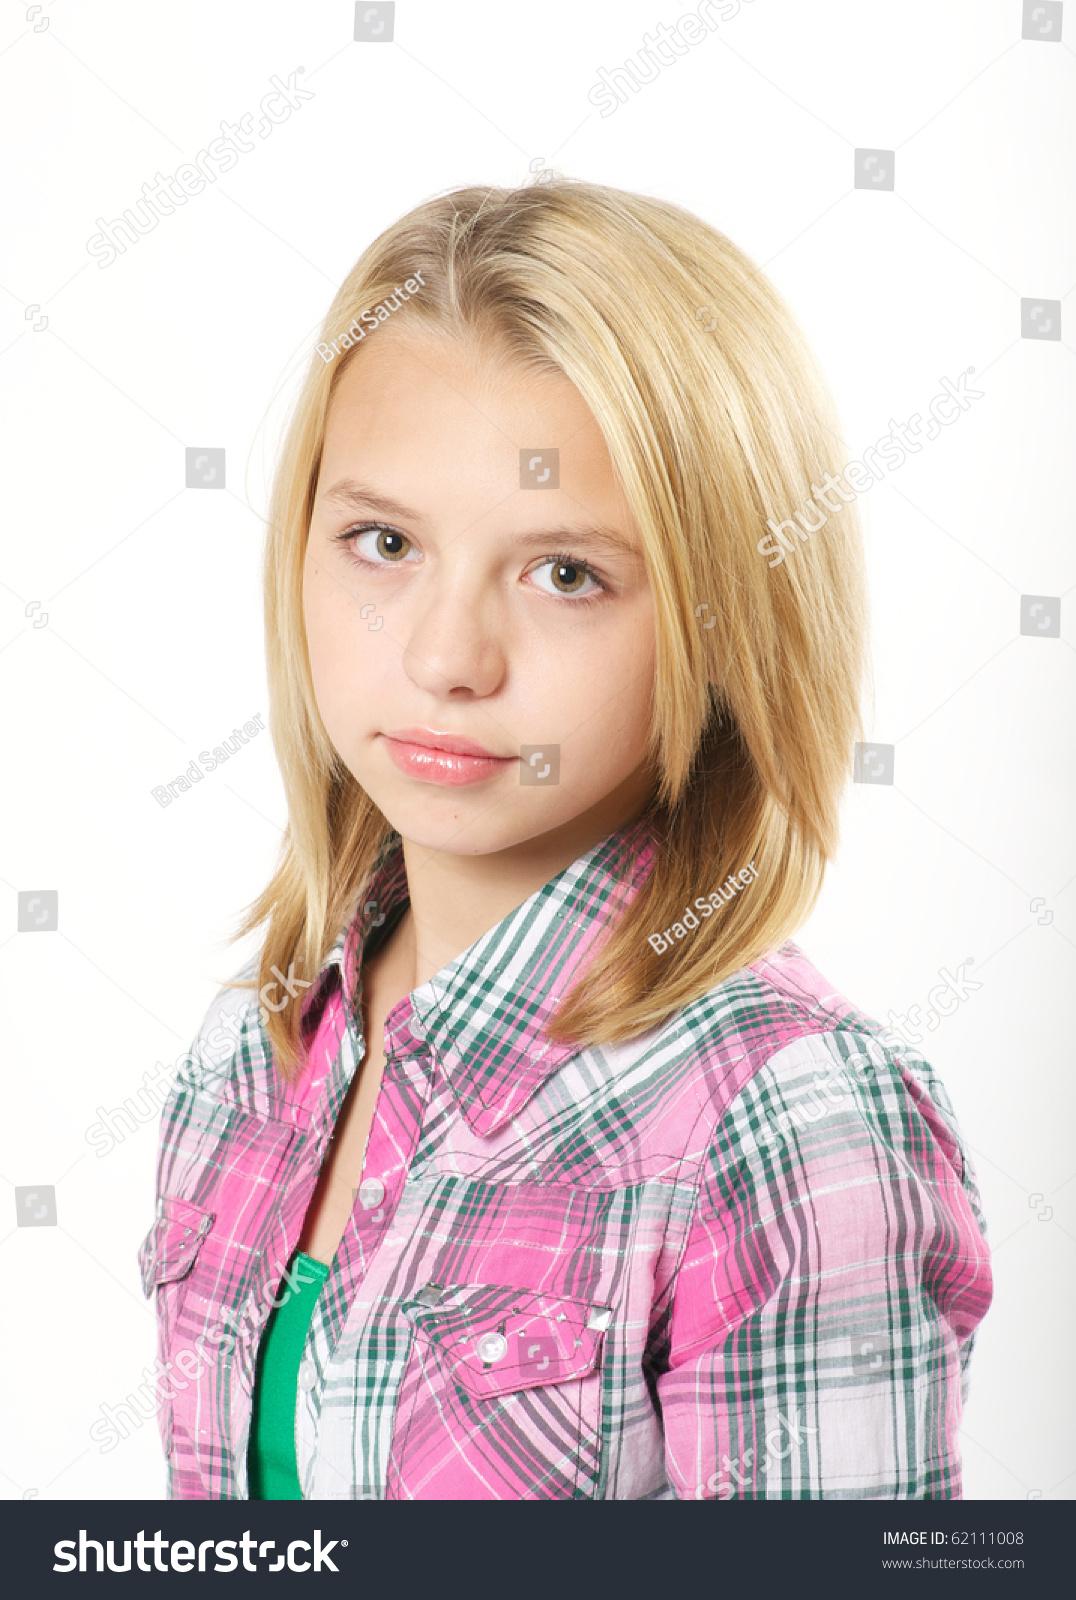 Young pre teen